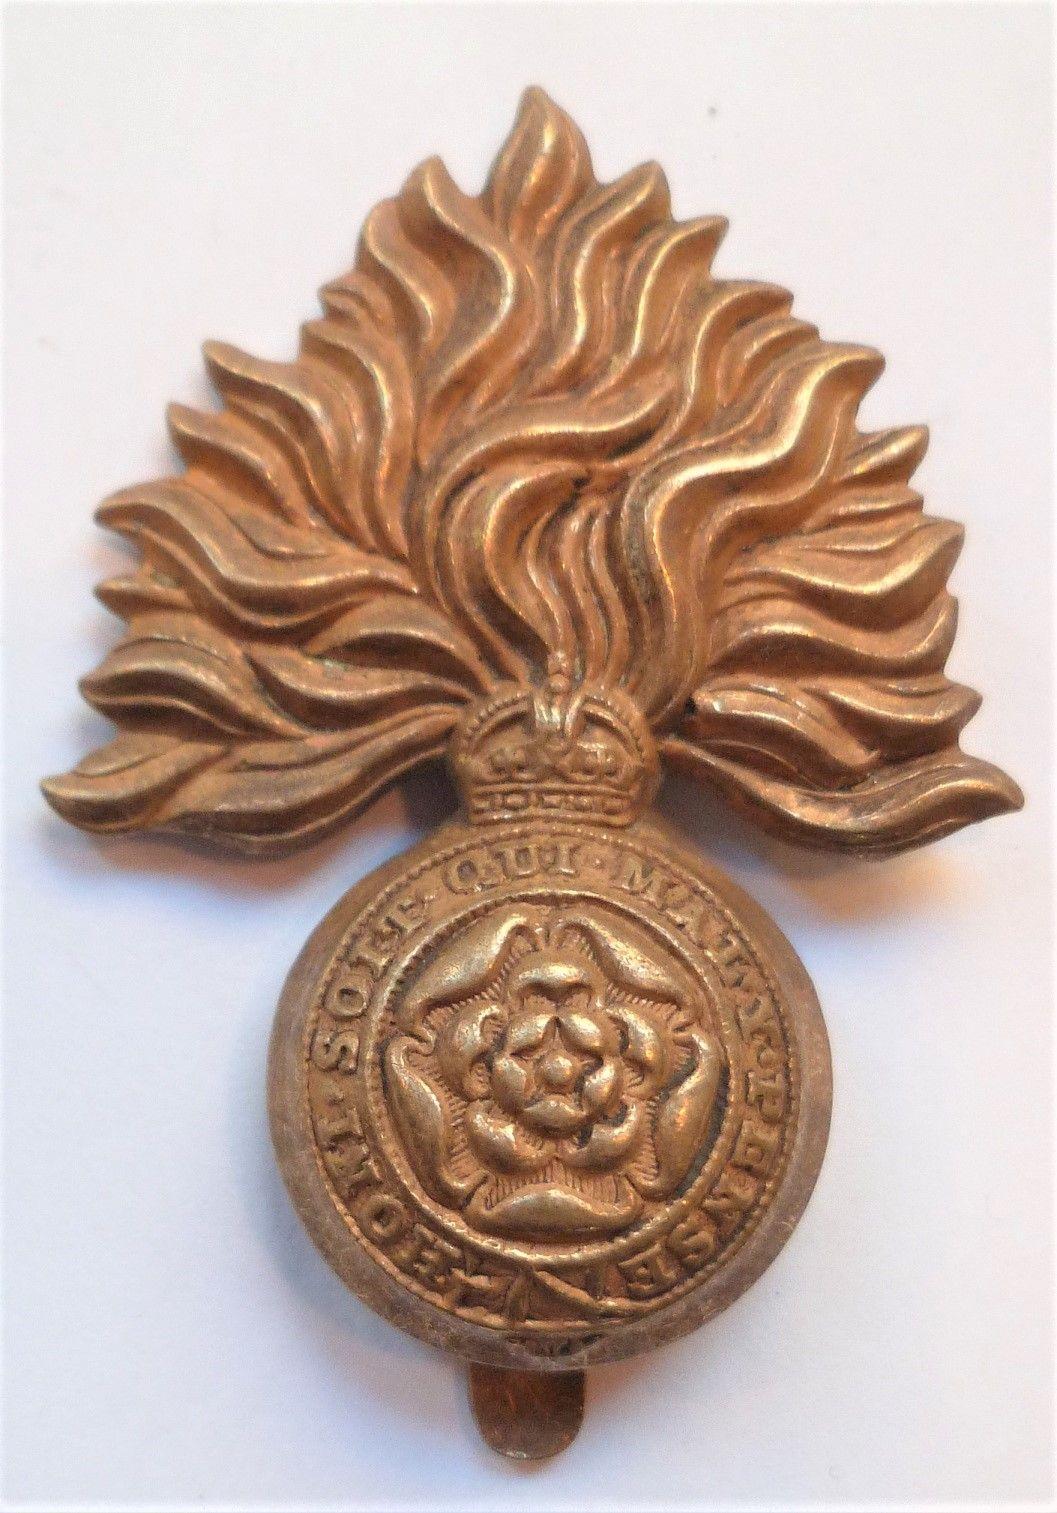 WW1 Royal Fusiliers Cap Badge military British Army World